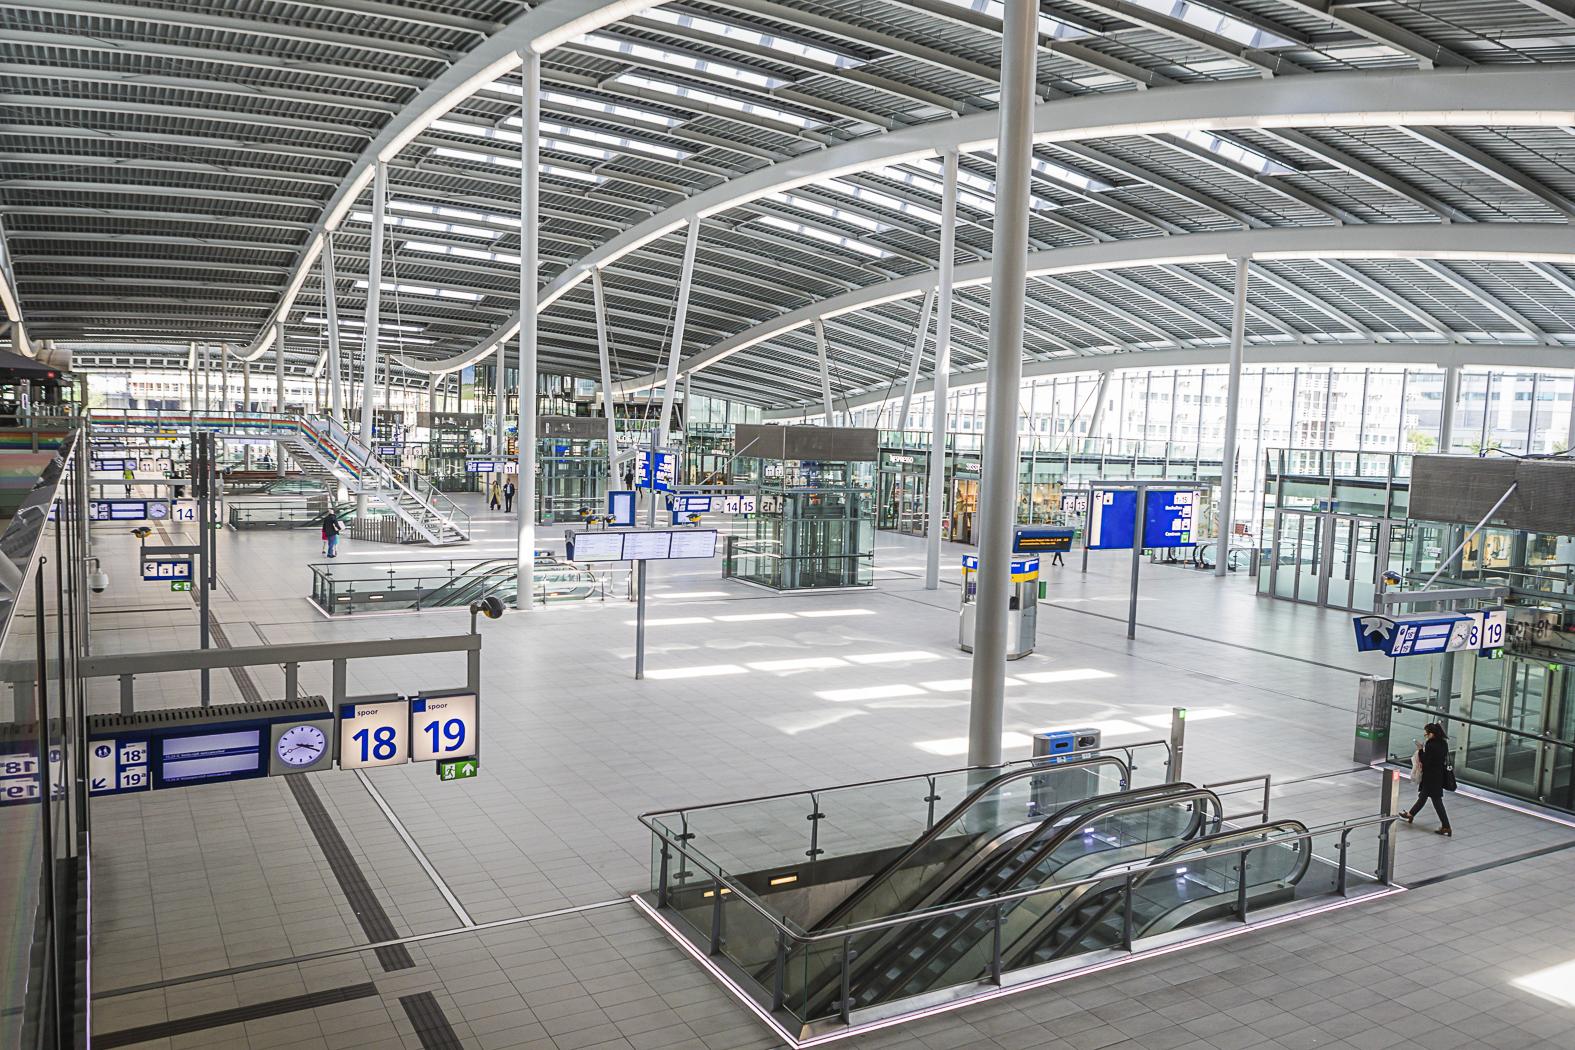 20190528-20190528-Station-Utrecht-CS-verlaten-4